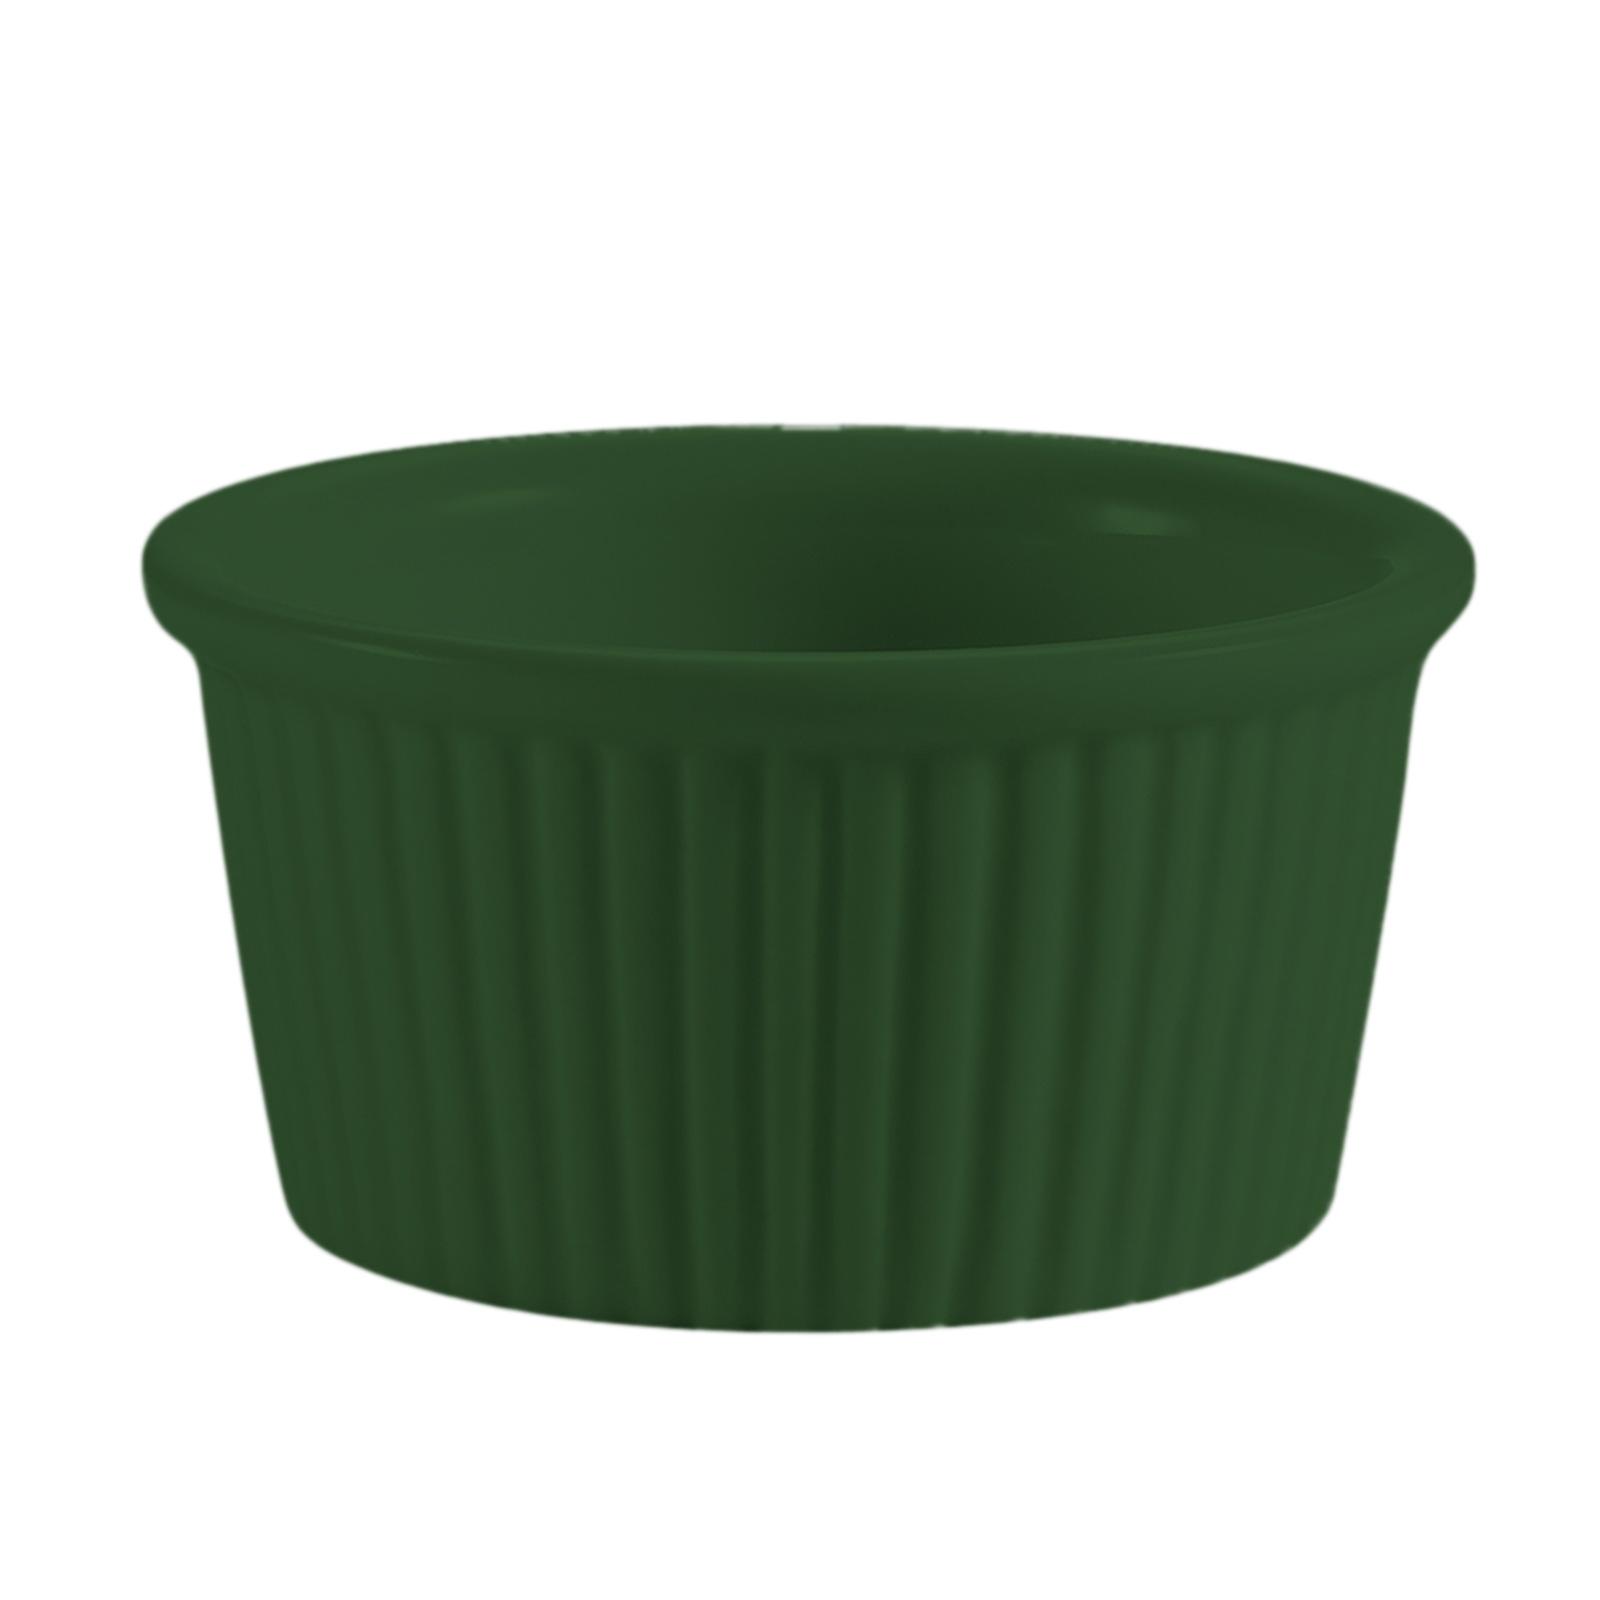 CAC China RKF-4-G ramekin / sauce cup, china